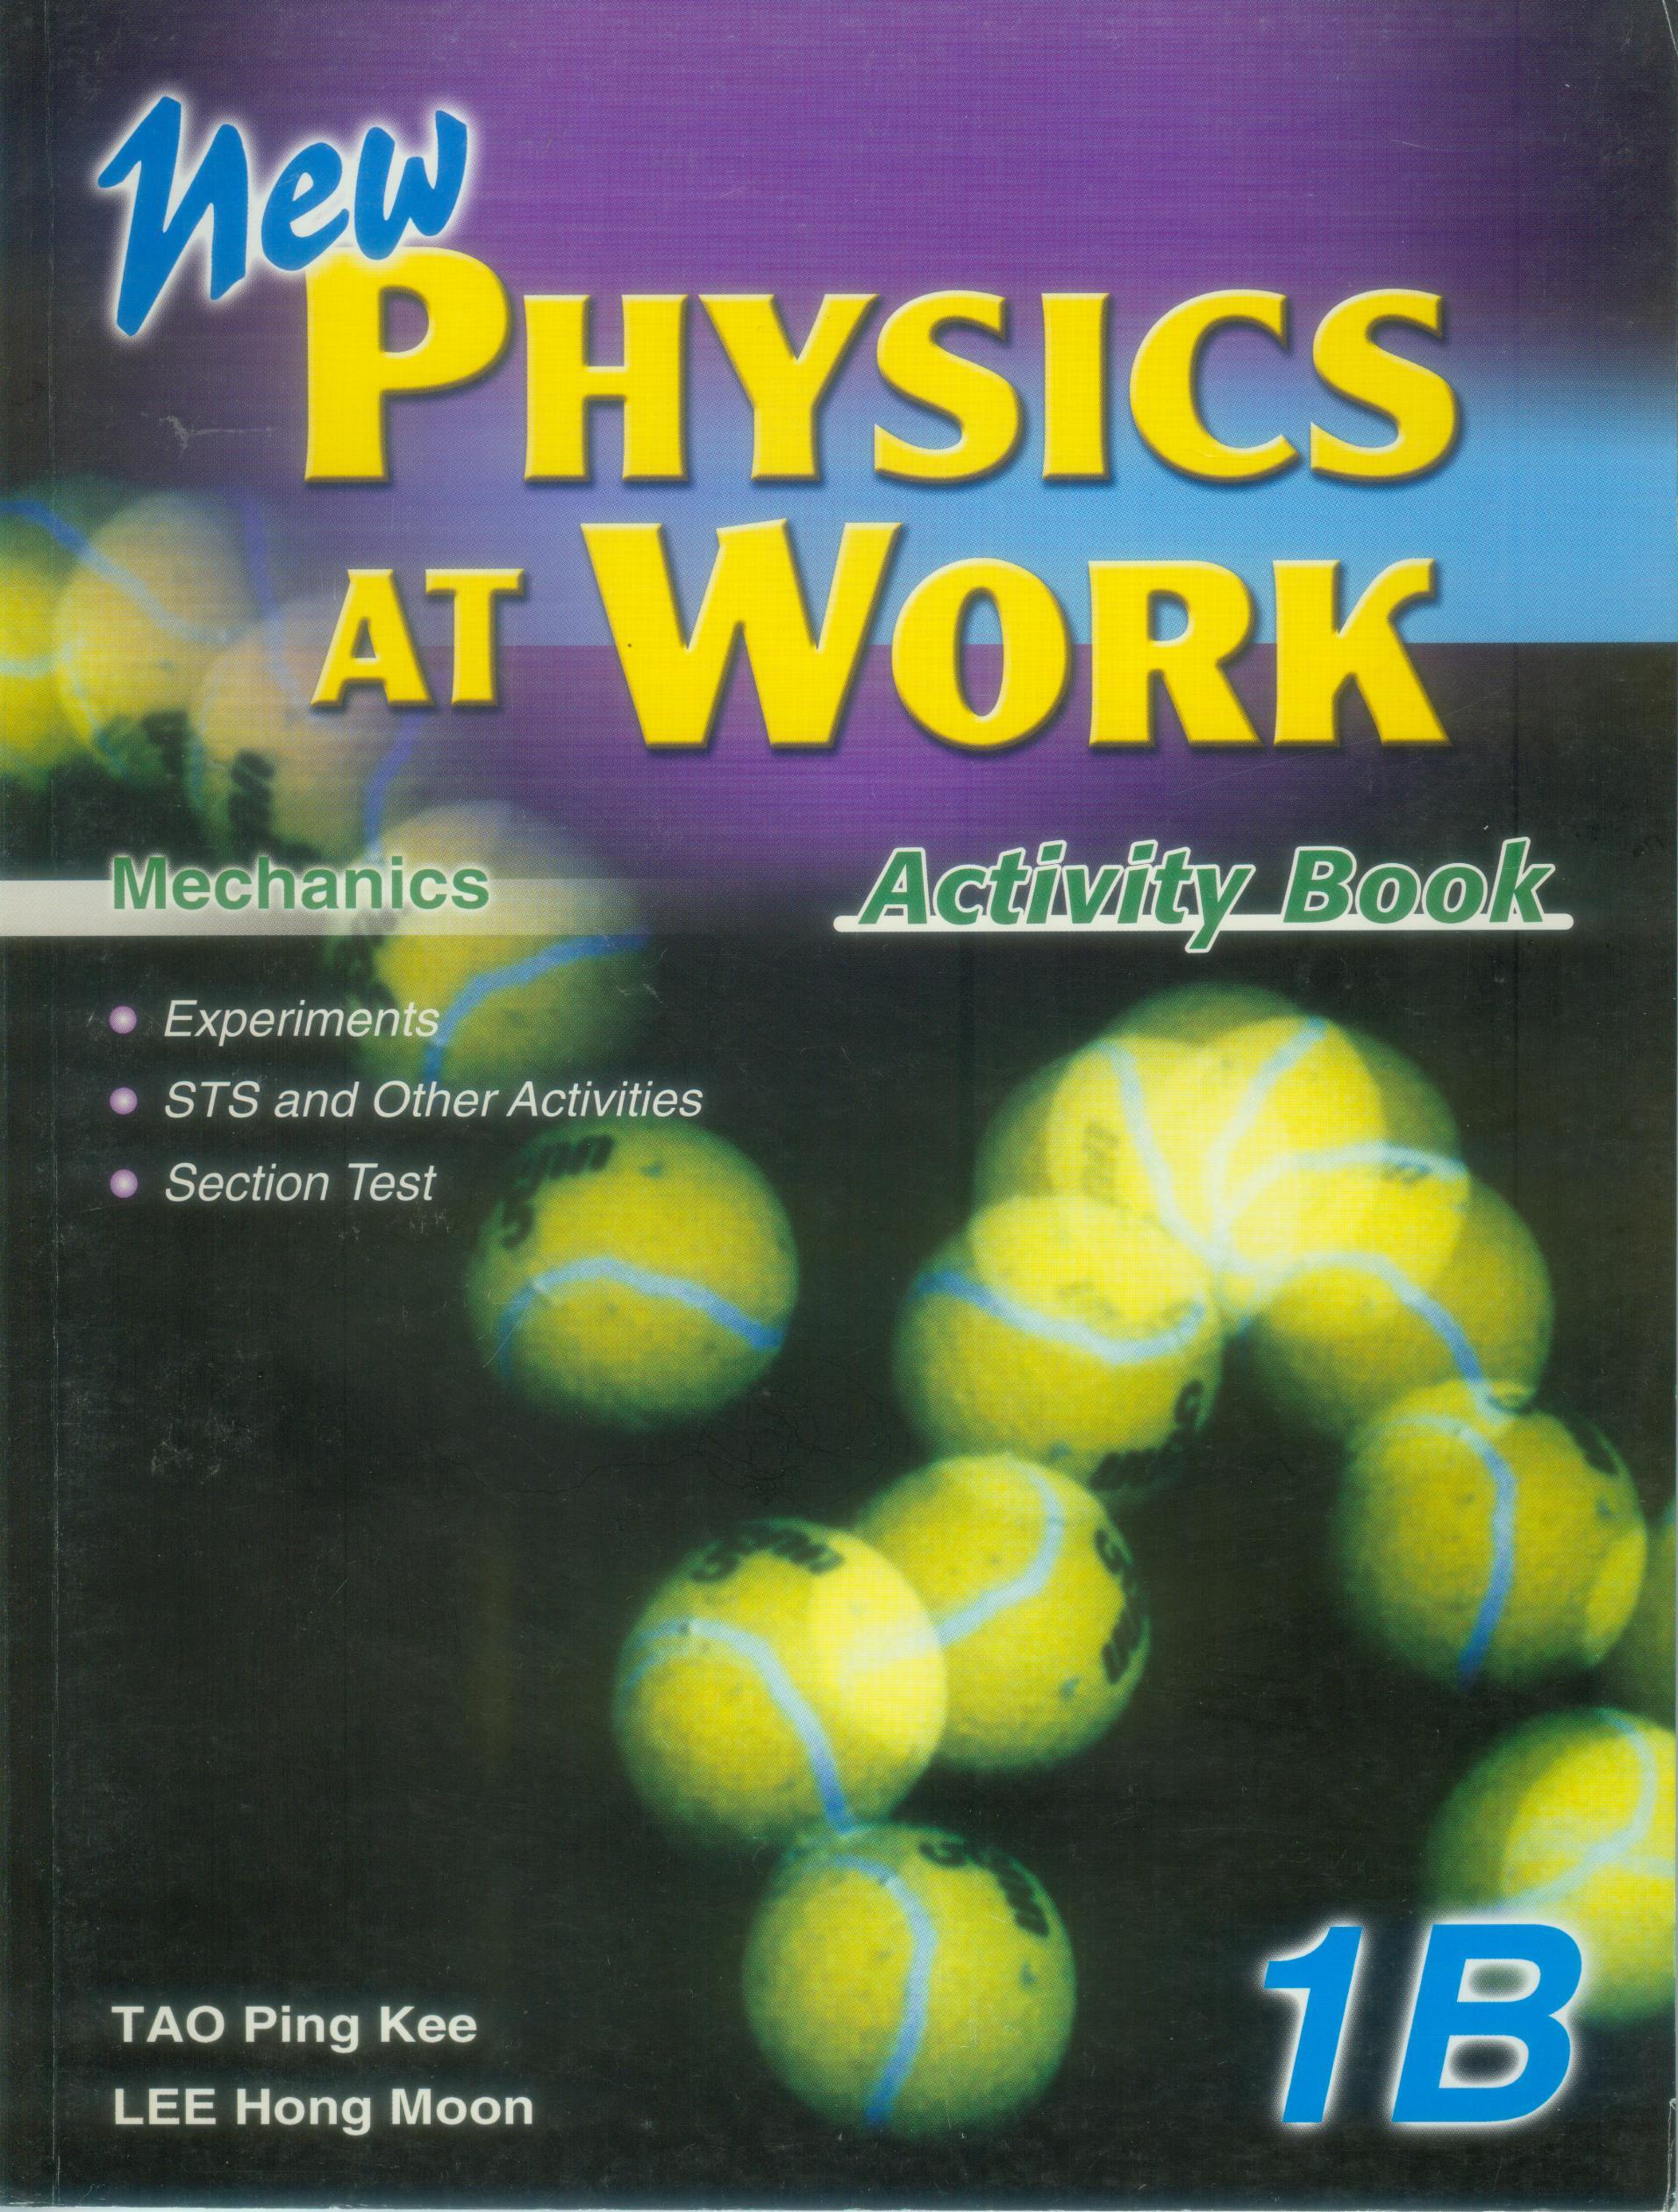 NewPhysics At Work 1B - Mechanics (Activity Book)